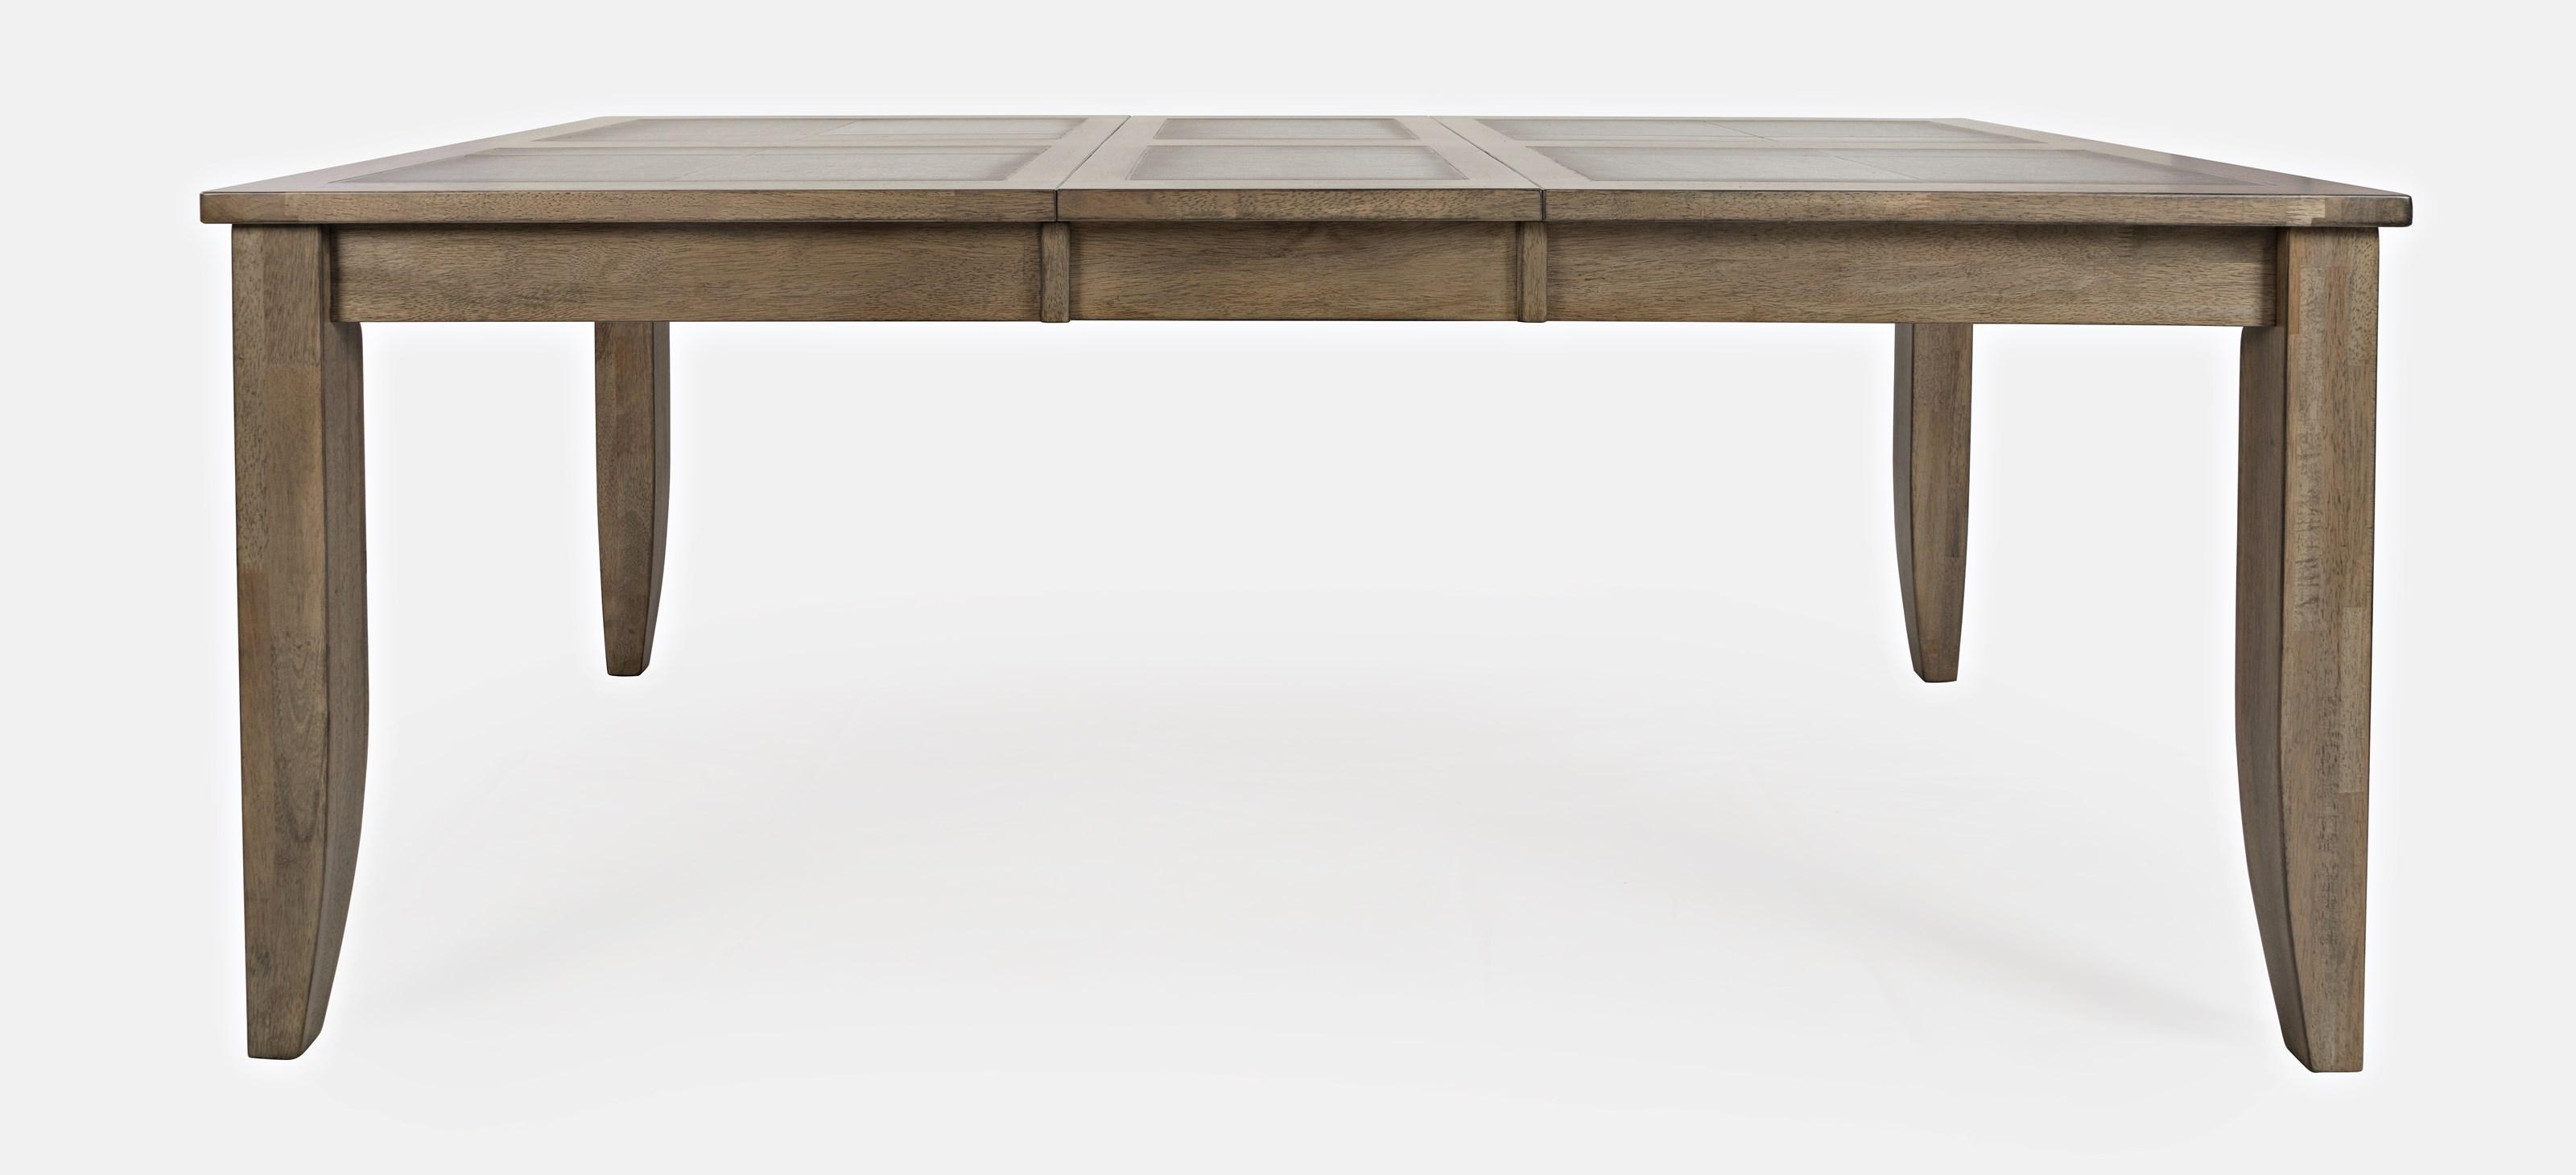 Prescott Park Extension Tile Top Dining Table by Jofran at Jofran